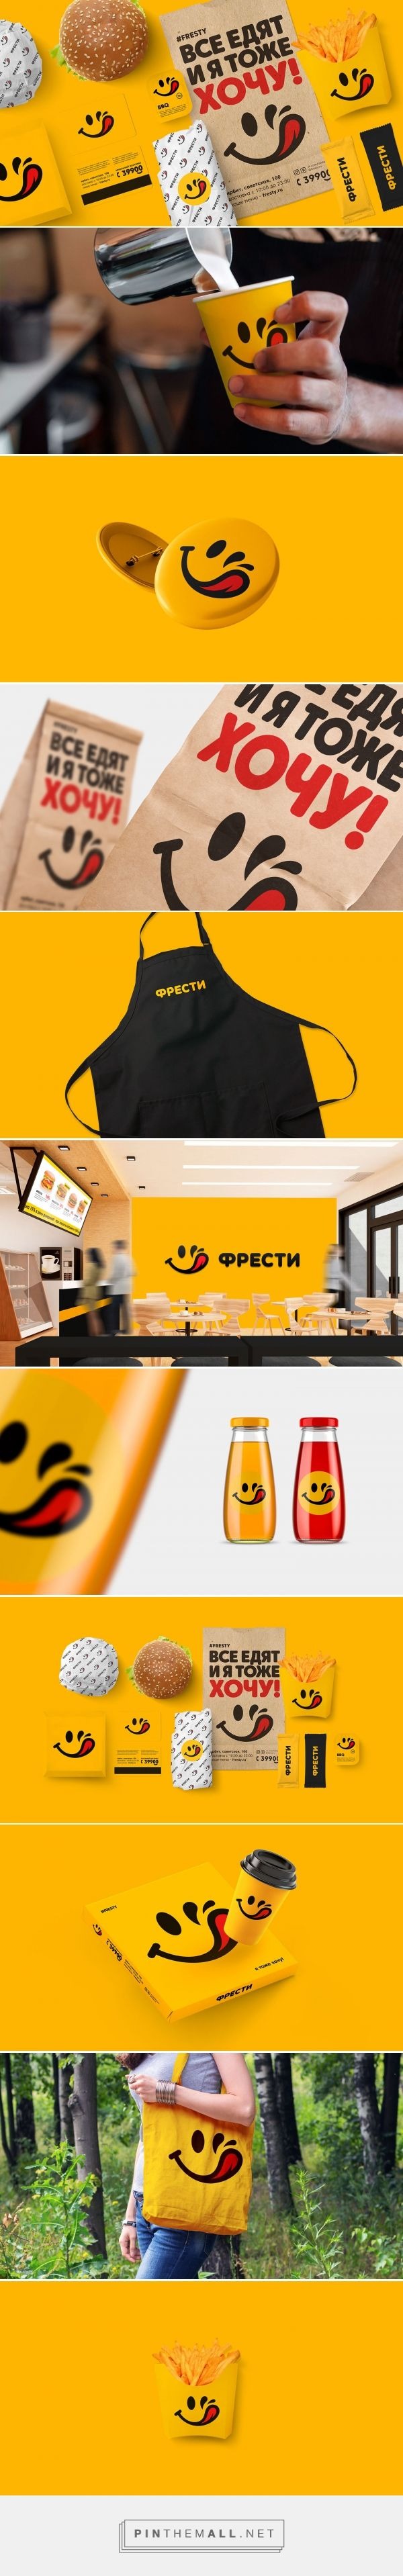 Fast food restaurant decor ideas - Fresty Fast Food Restaurant Branding By Konstantin Polyakov